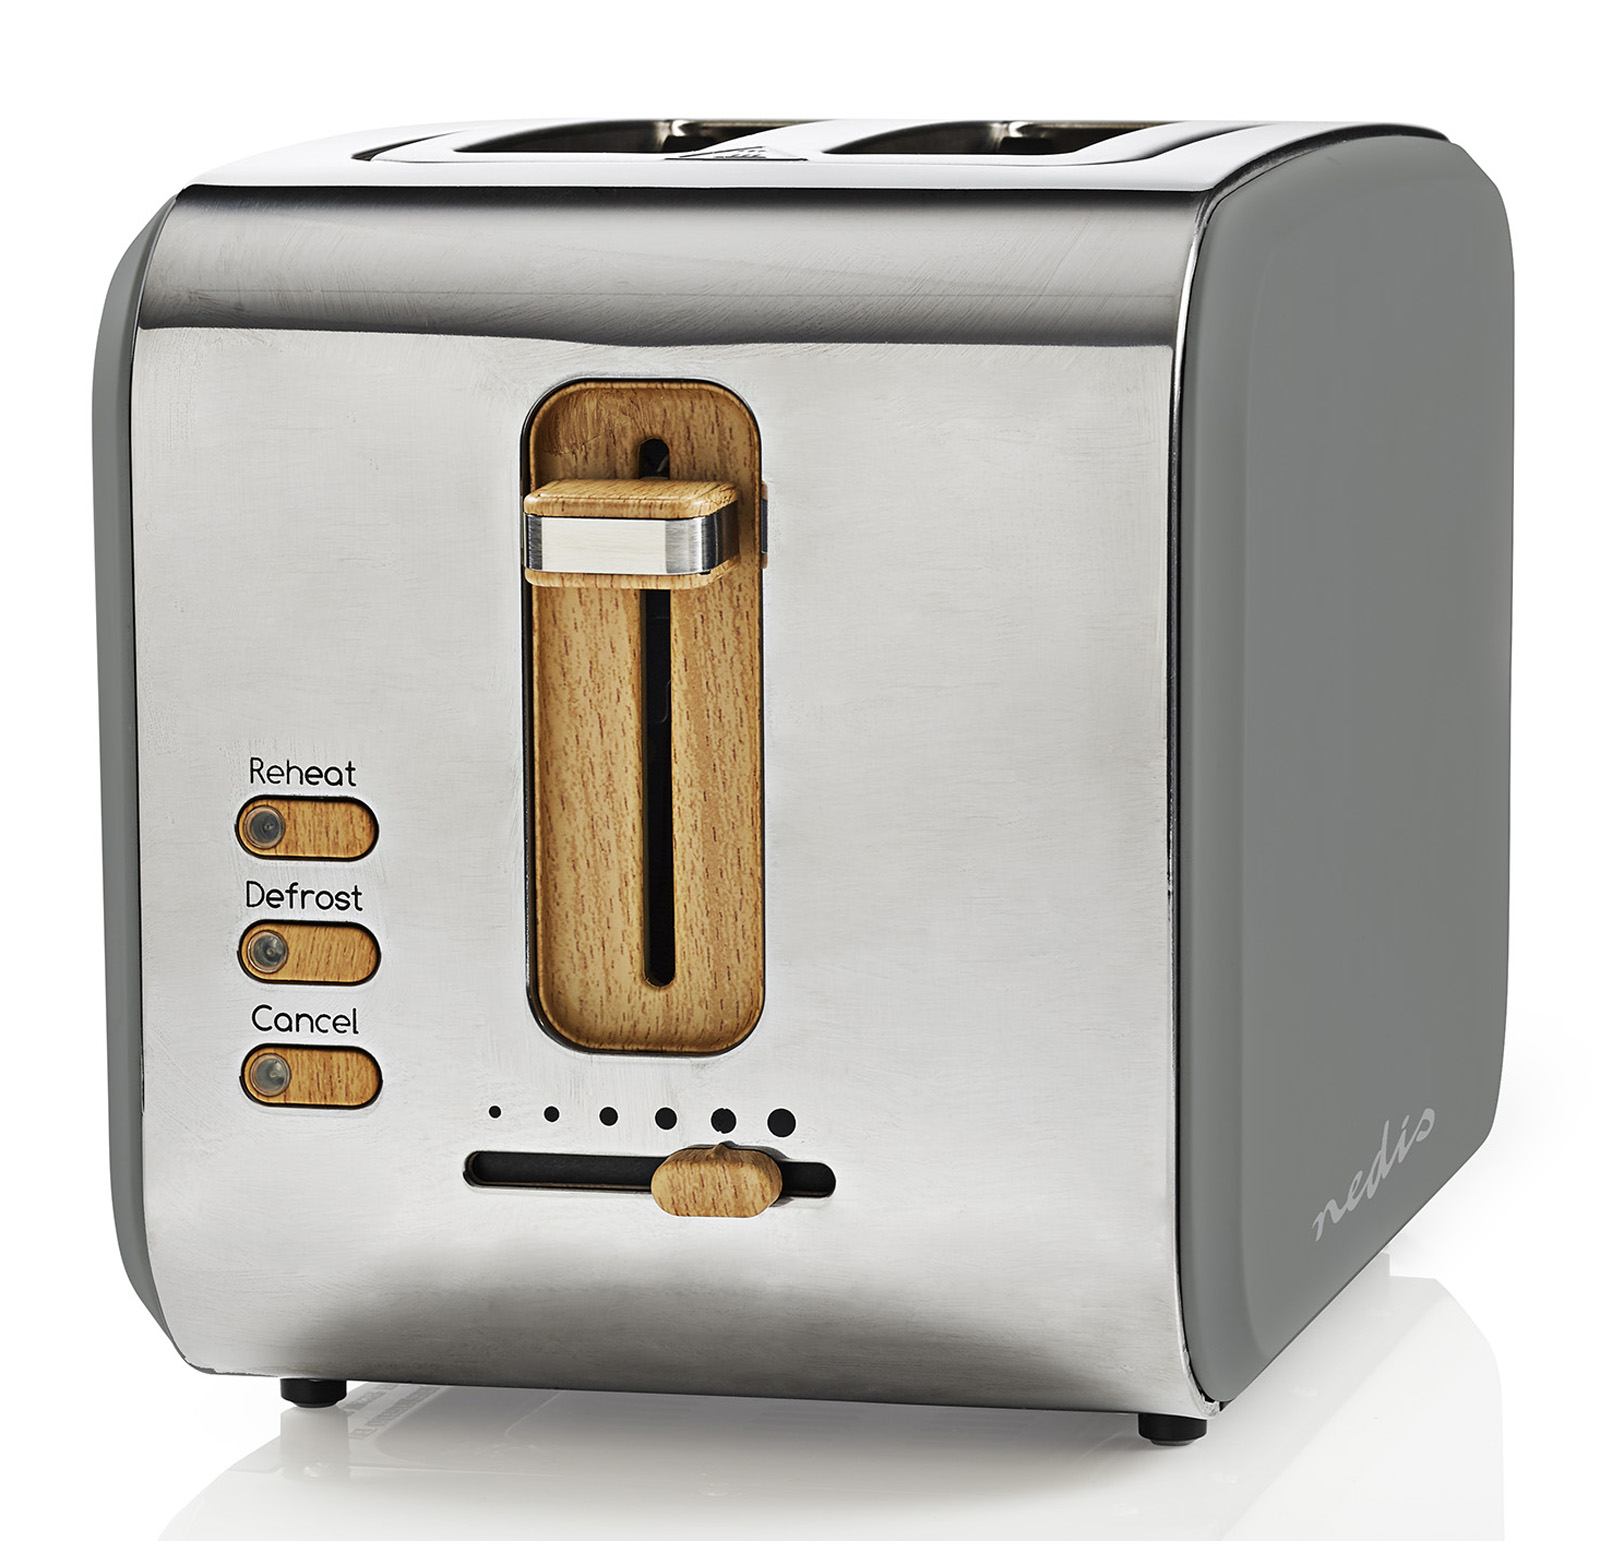 <h1>Nedis Soft-Touch-Toaster KABT510</h1><h3 style='font-size: 20px; margin: 0px 0px 15px 0px;'> -2-Scheiben Toaster, Soft-Touch-Oberfläche, Retro Design</h3>